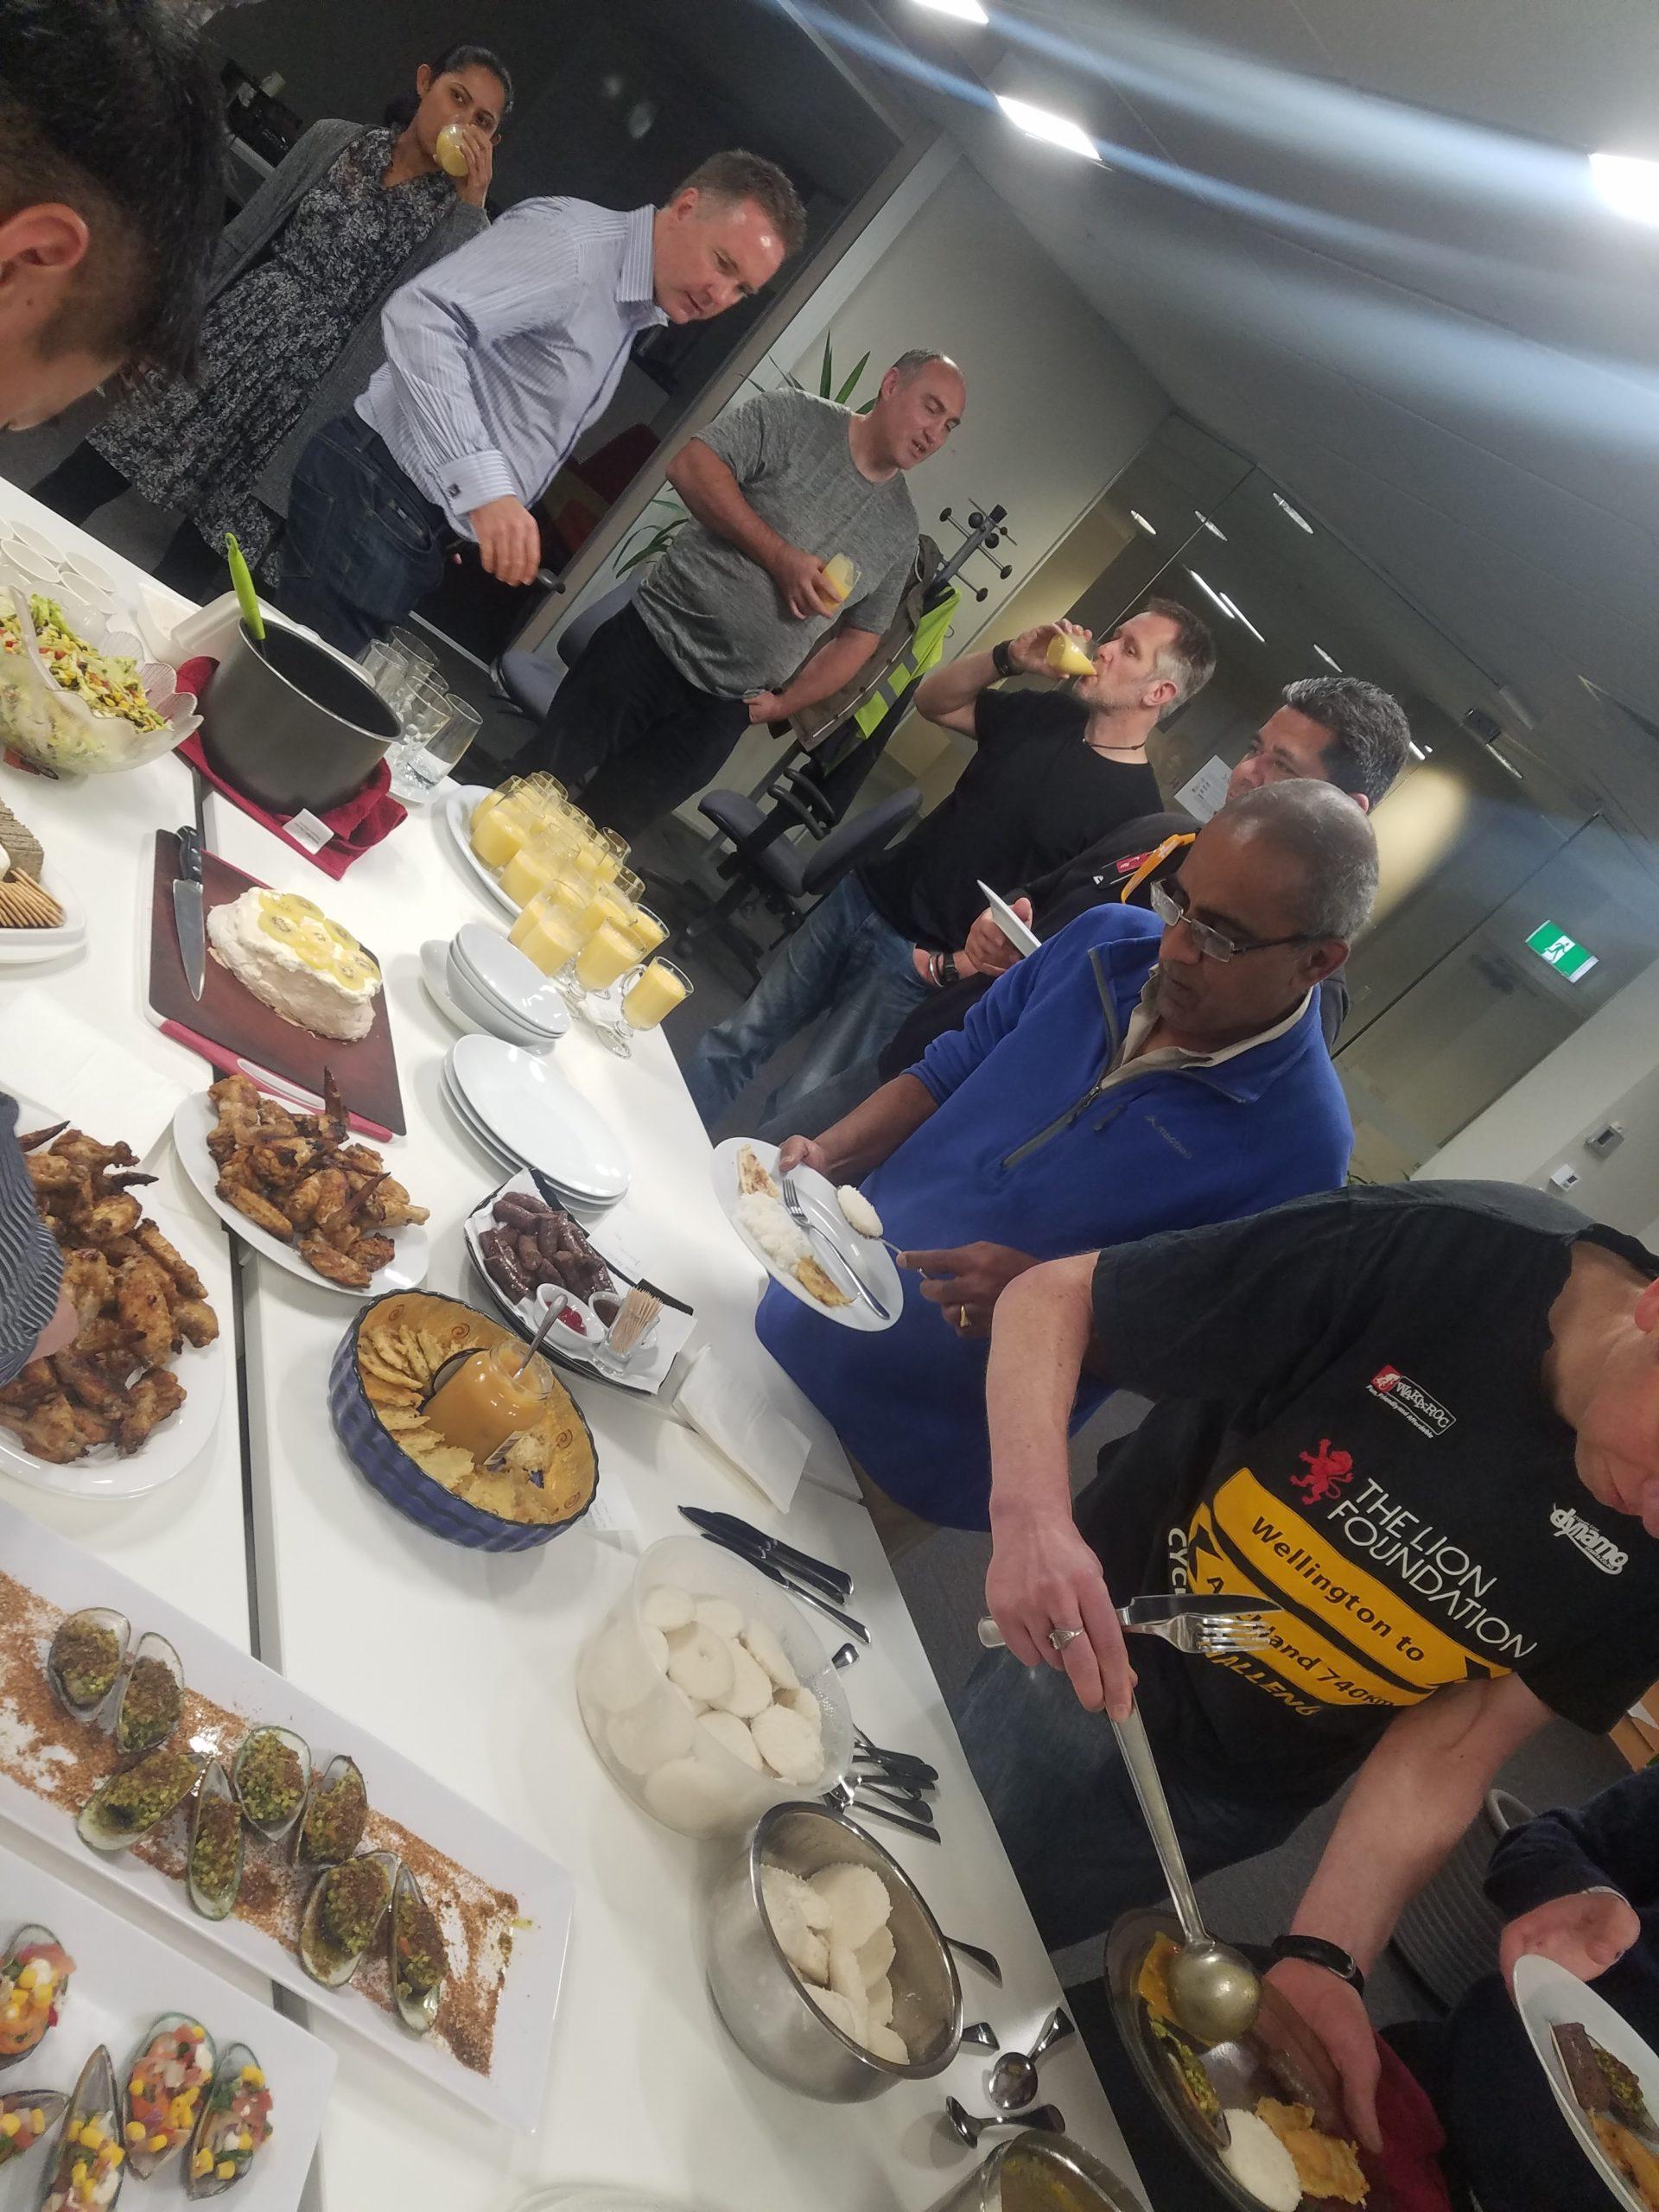 The Reckon NZ team having lunch